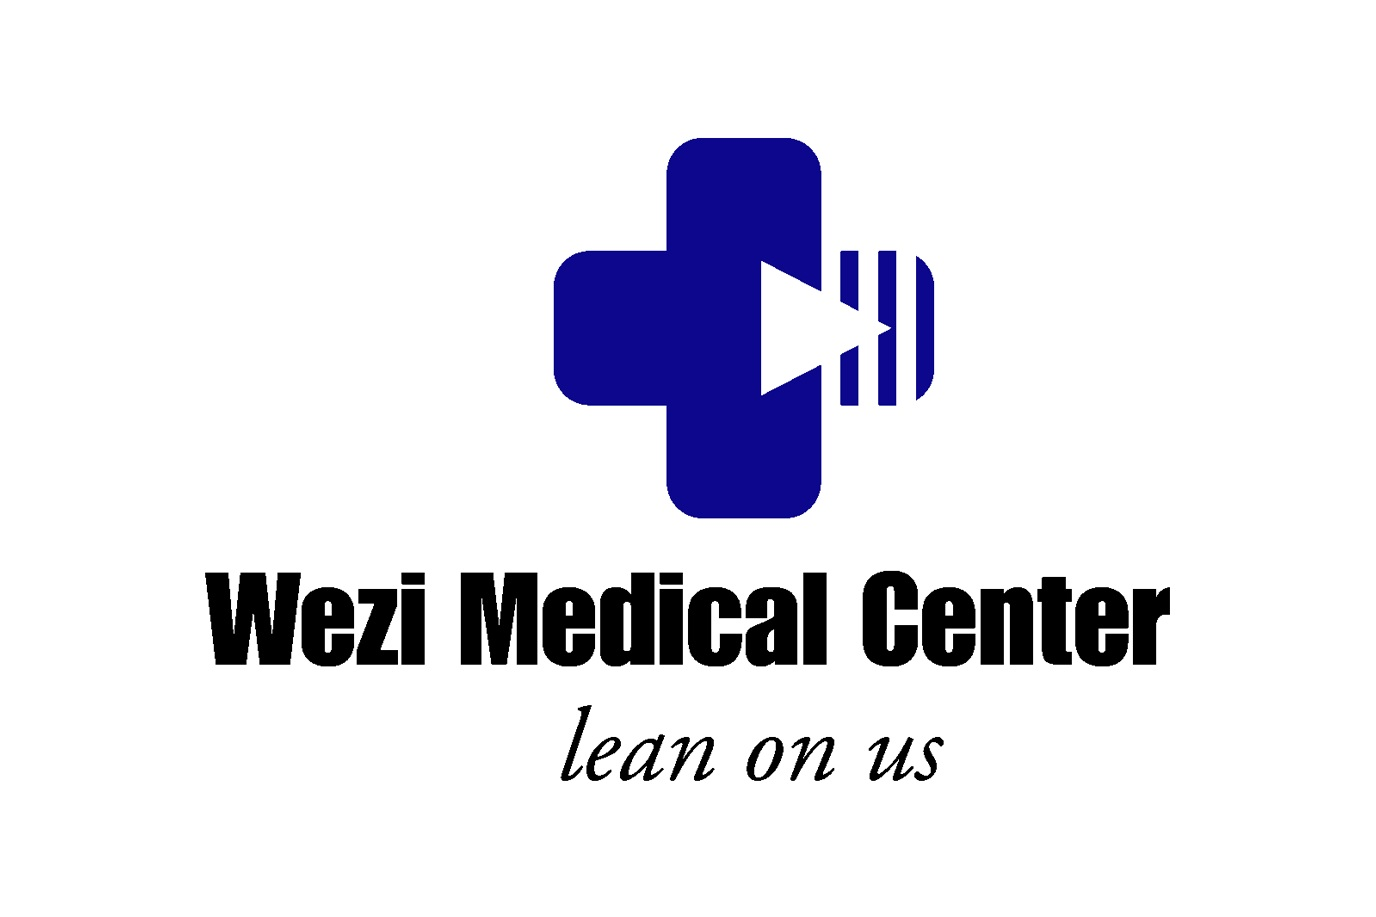 11.+Wezi+medical+center+copy+copy.jpg